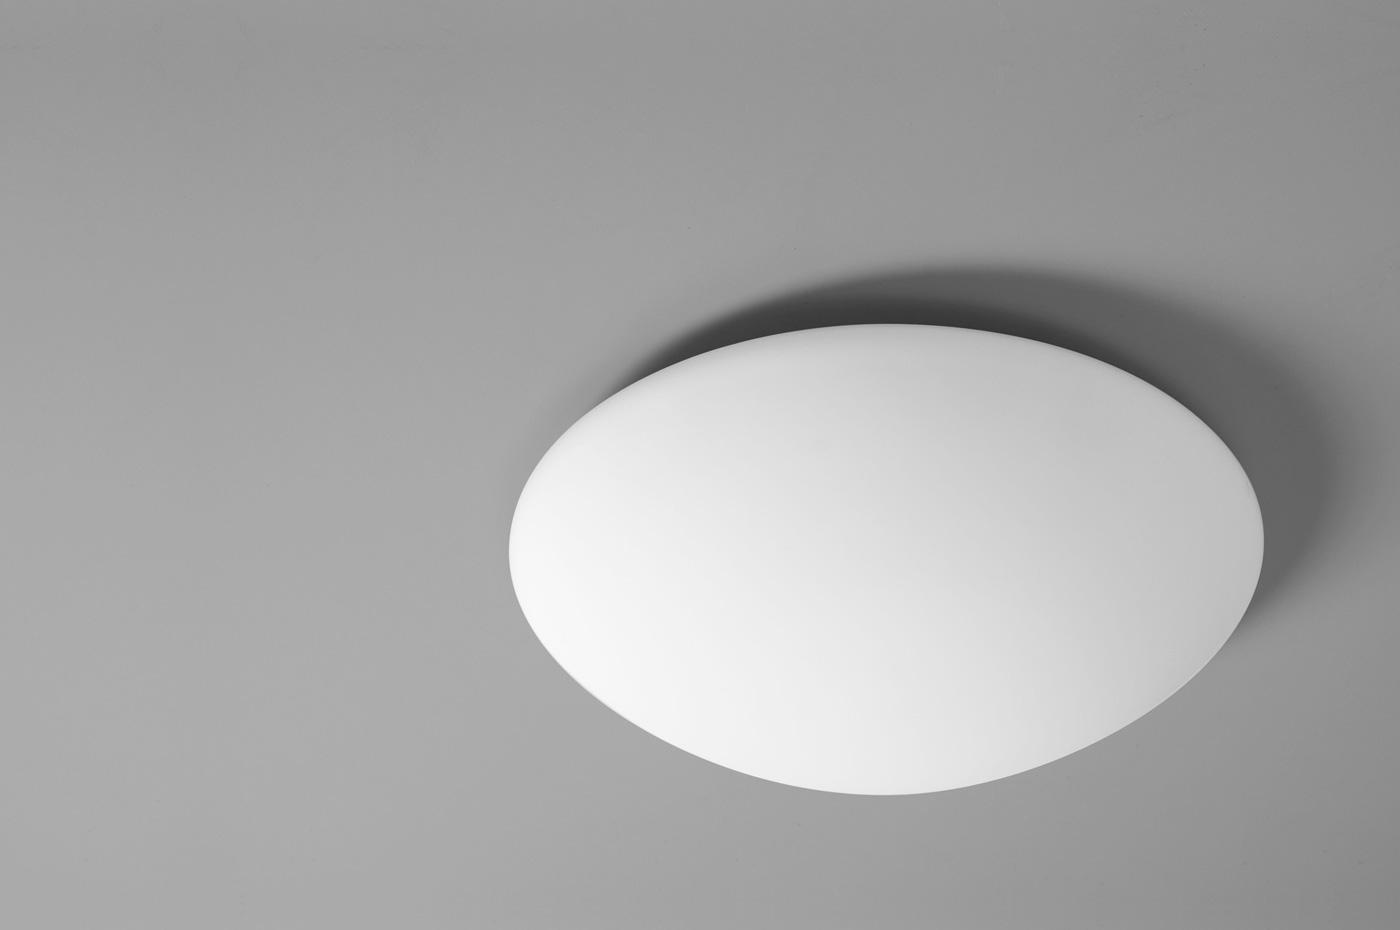 Plafoniera Bagno : Led plafoniera quadrata design bagno sora 12 watt. plafoniere